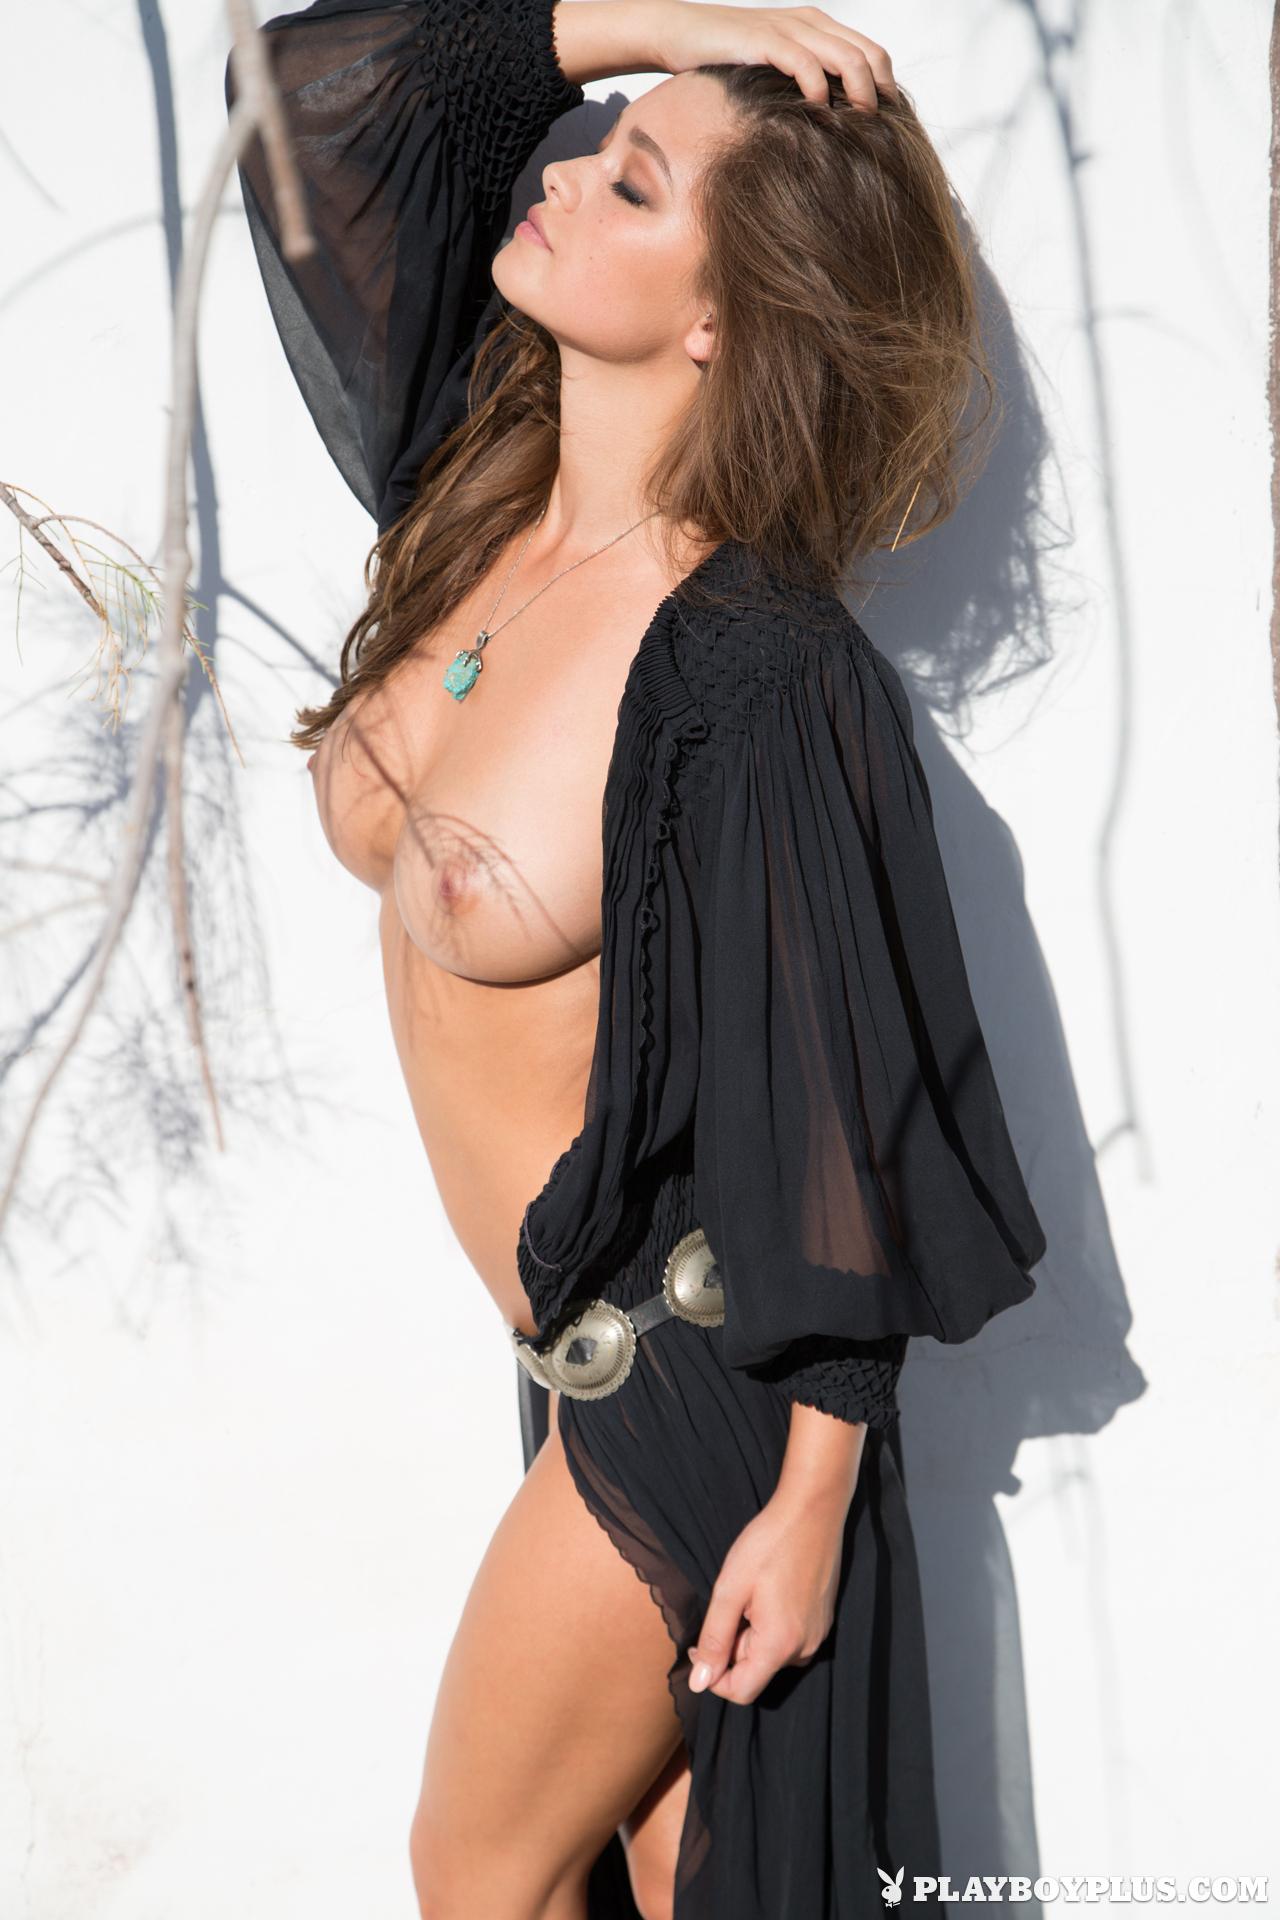 Alyssa arce naked in shower - 1 part 10